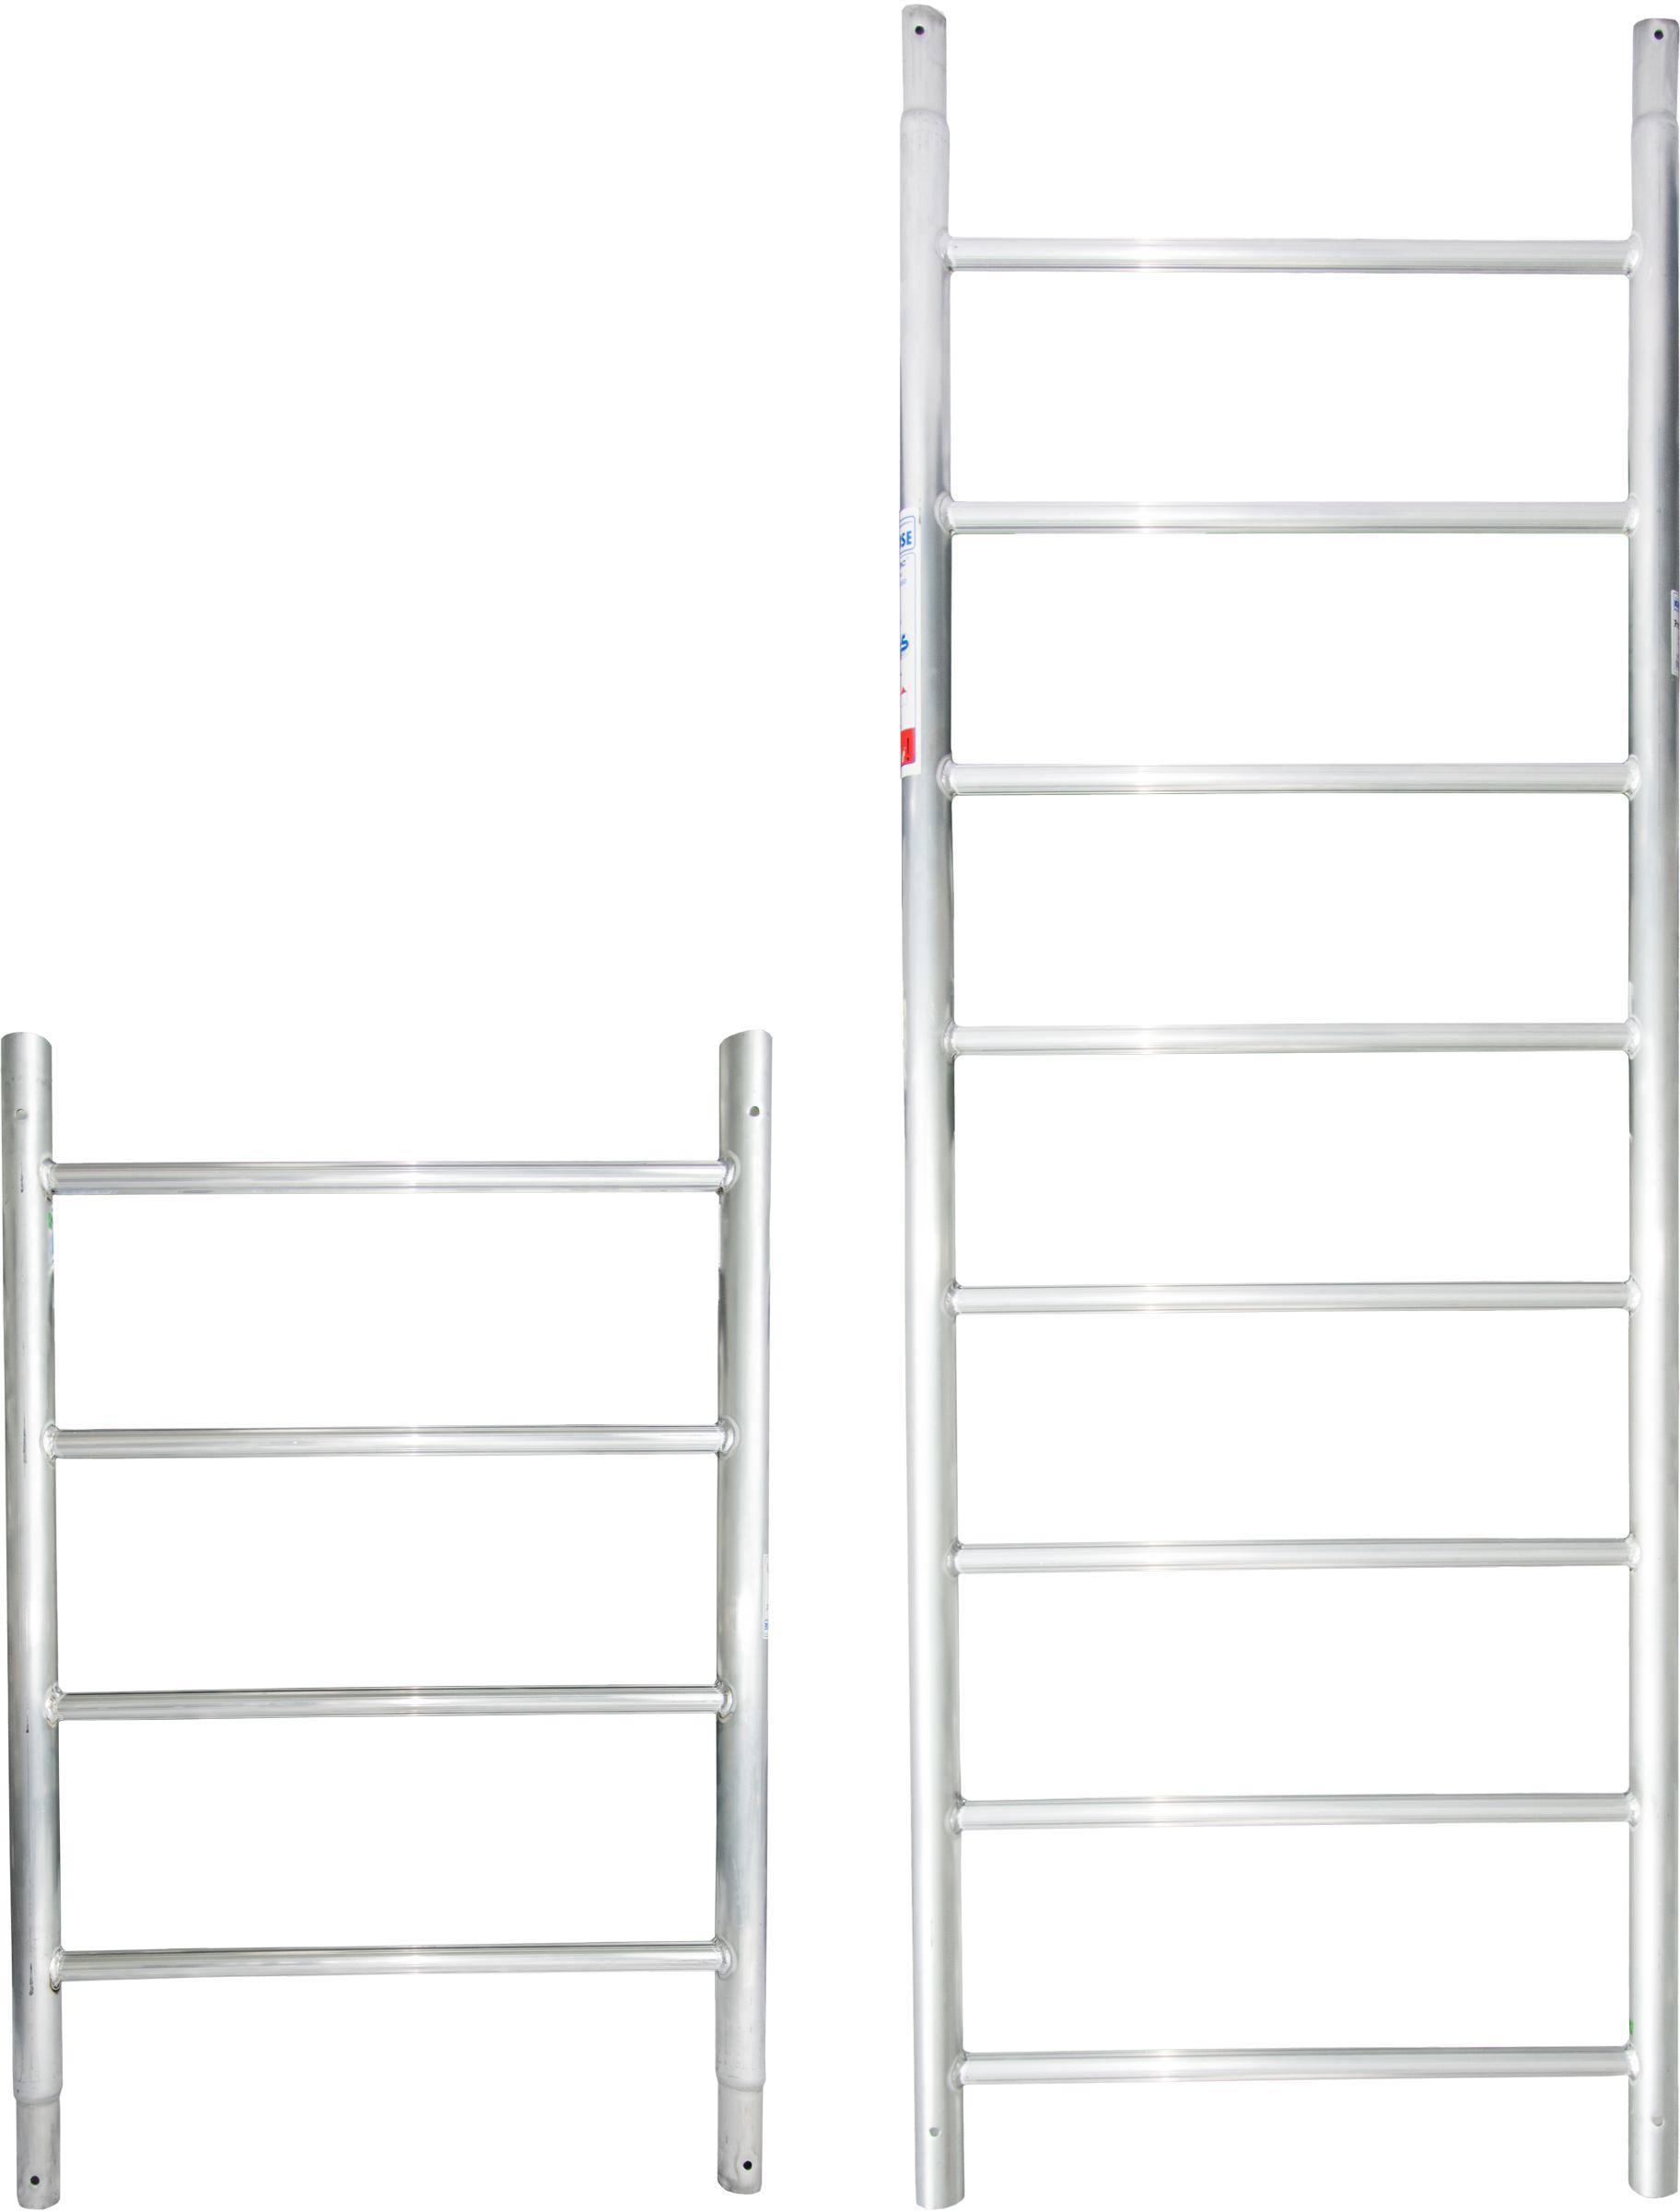 Krause Rollgerüst ClimTec Vertikalrahmen